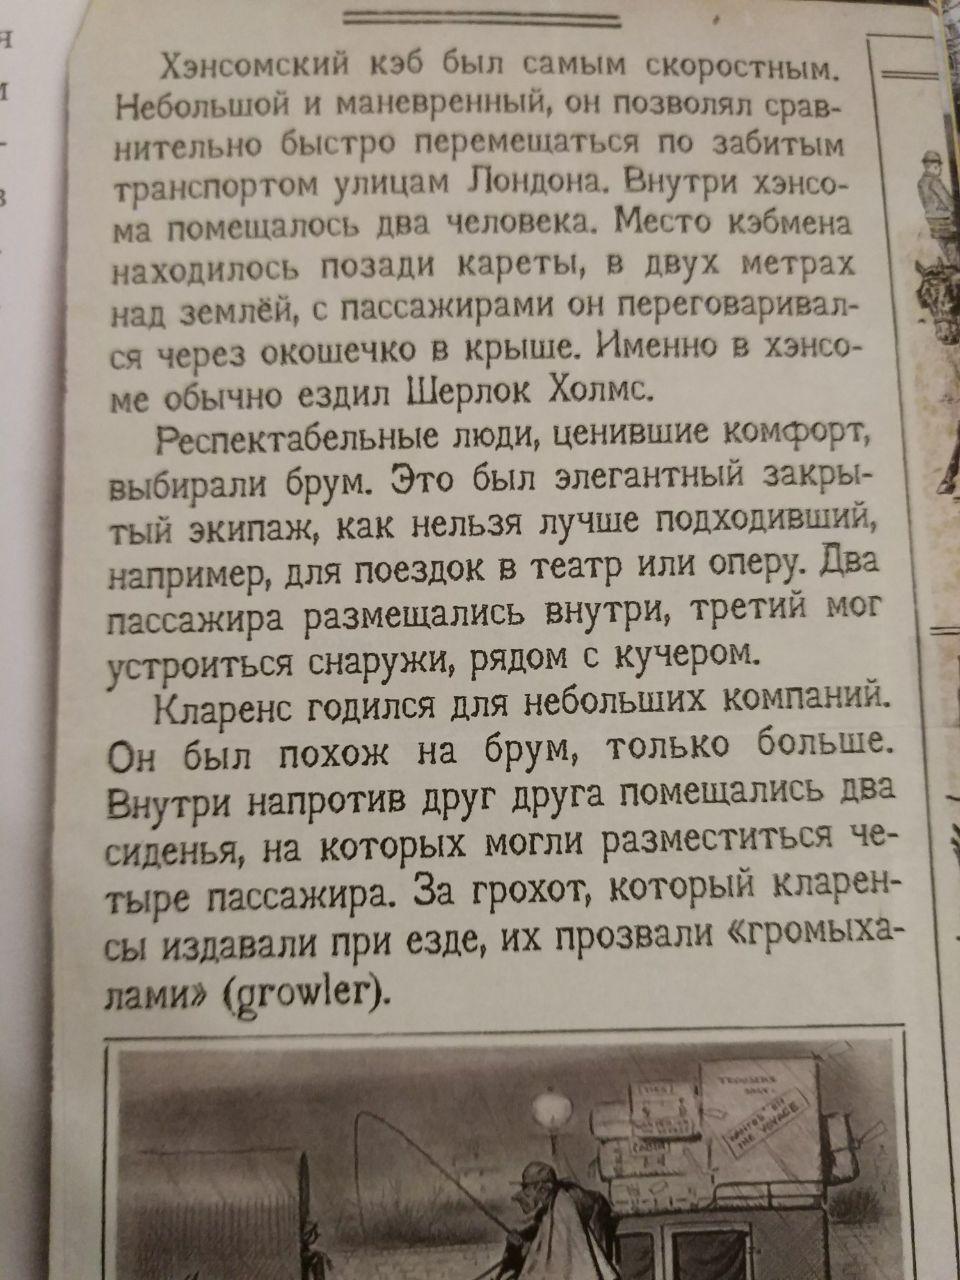 http://s7.uploads.ru/nCAmy.jpg